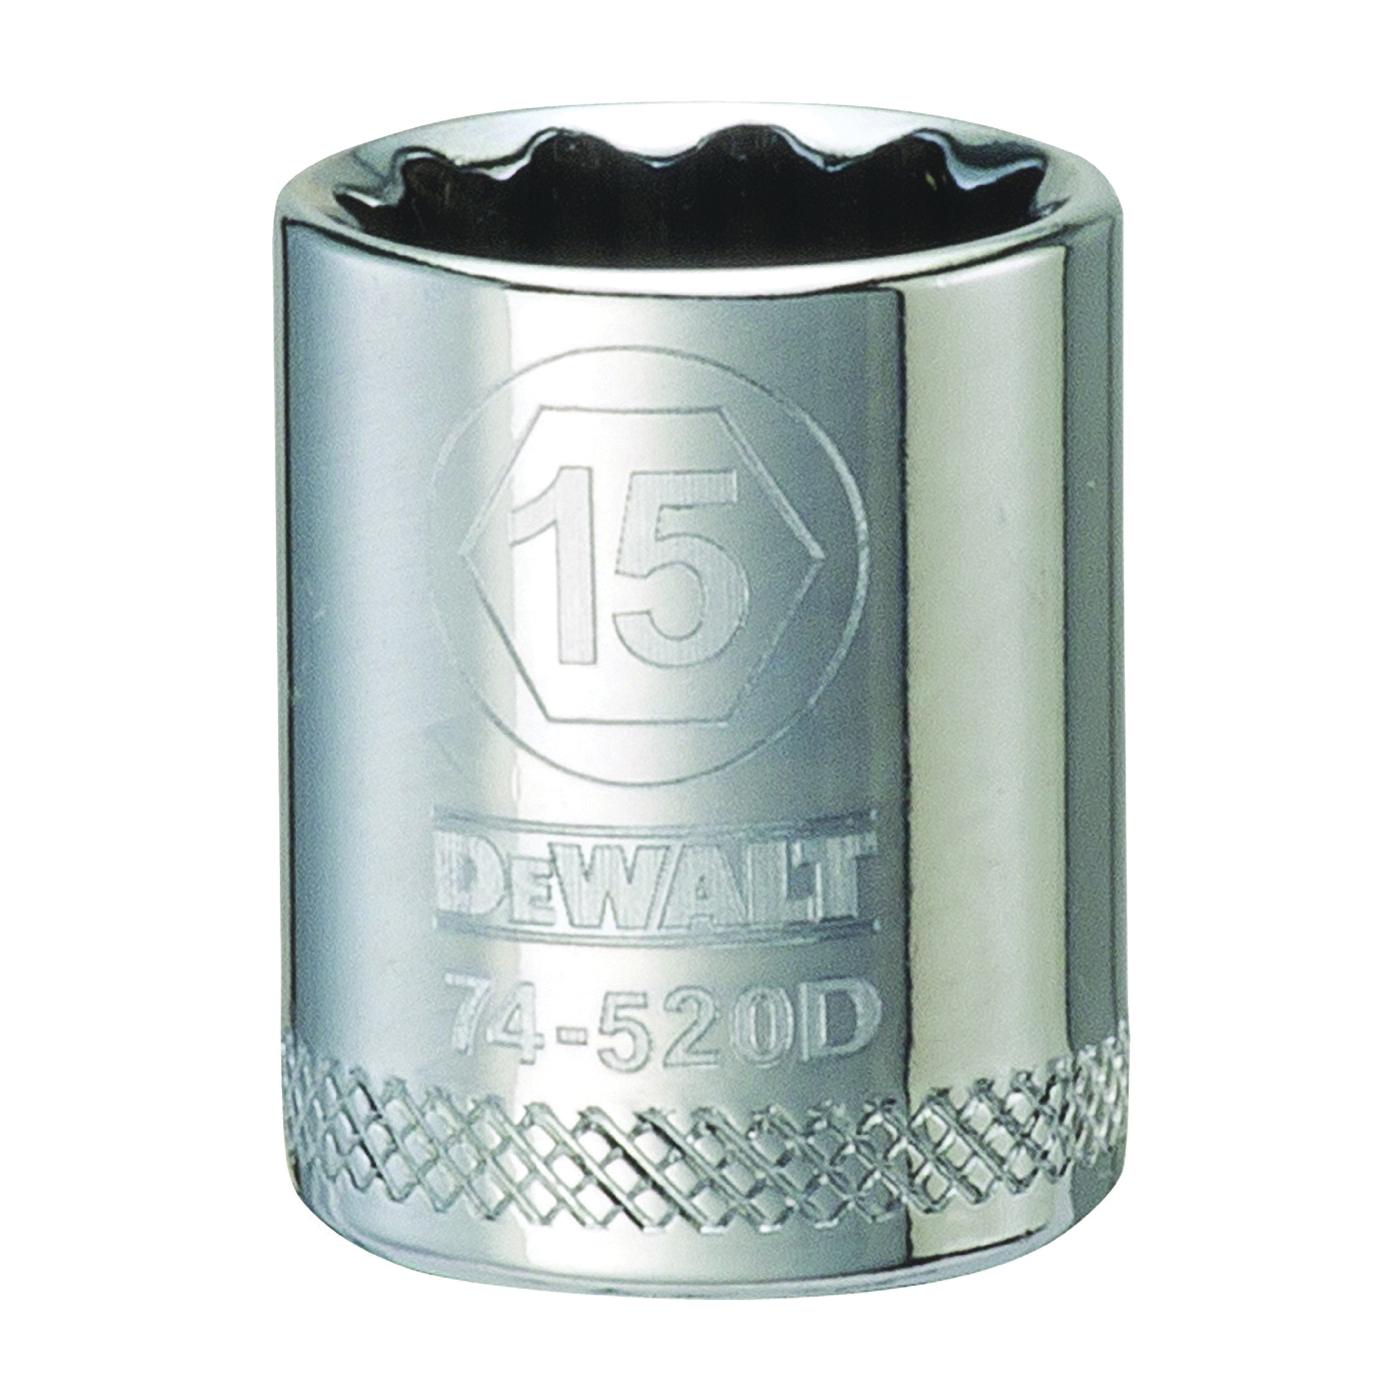 Picture of DeWALT DWMT74520OSP Hand Socket, 15 mm Socket, 3/8 in Drive, 12 -Point, Vanadium Steel, Polished Chrome